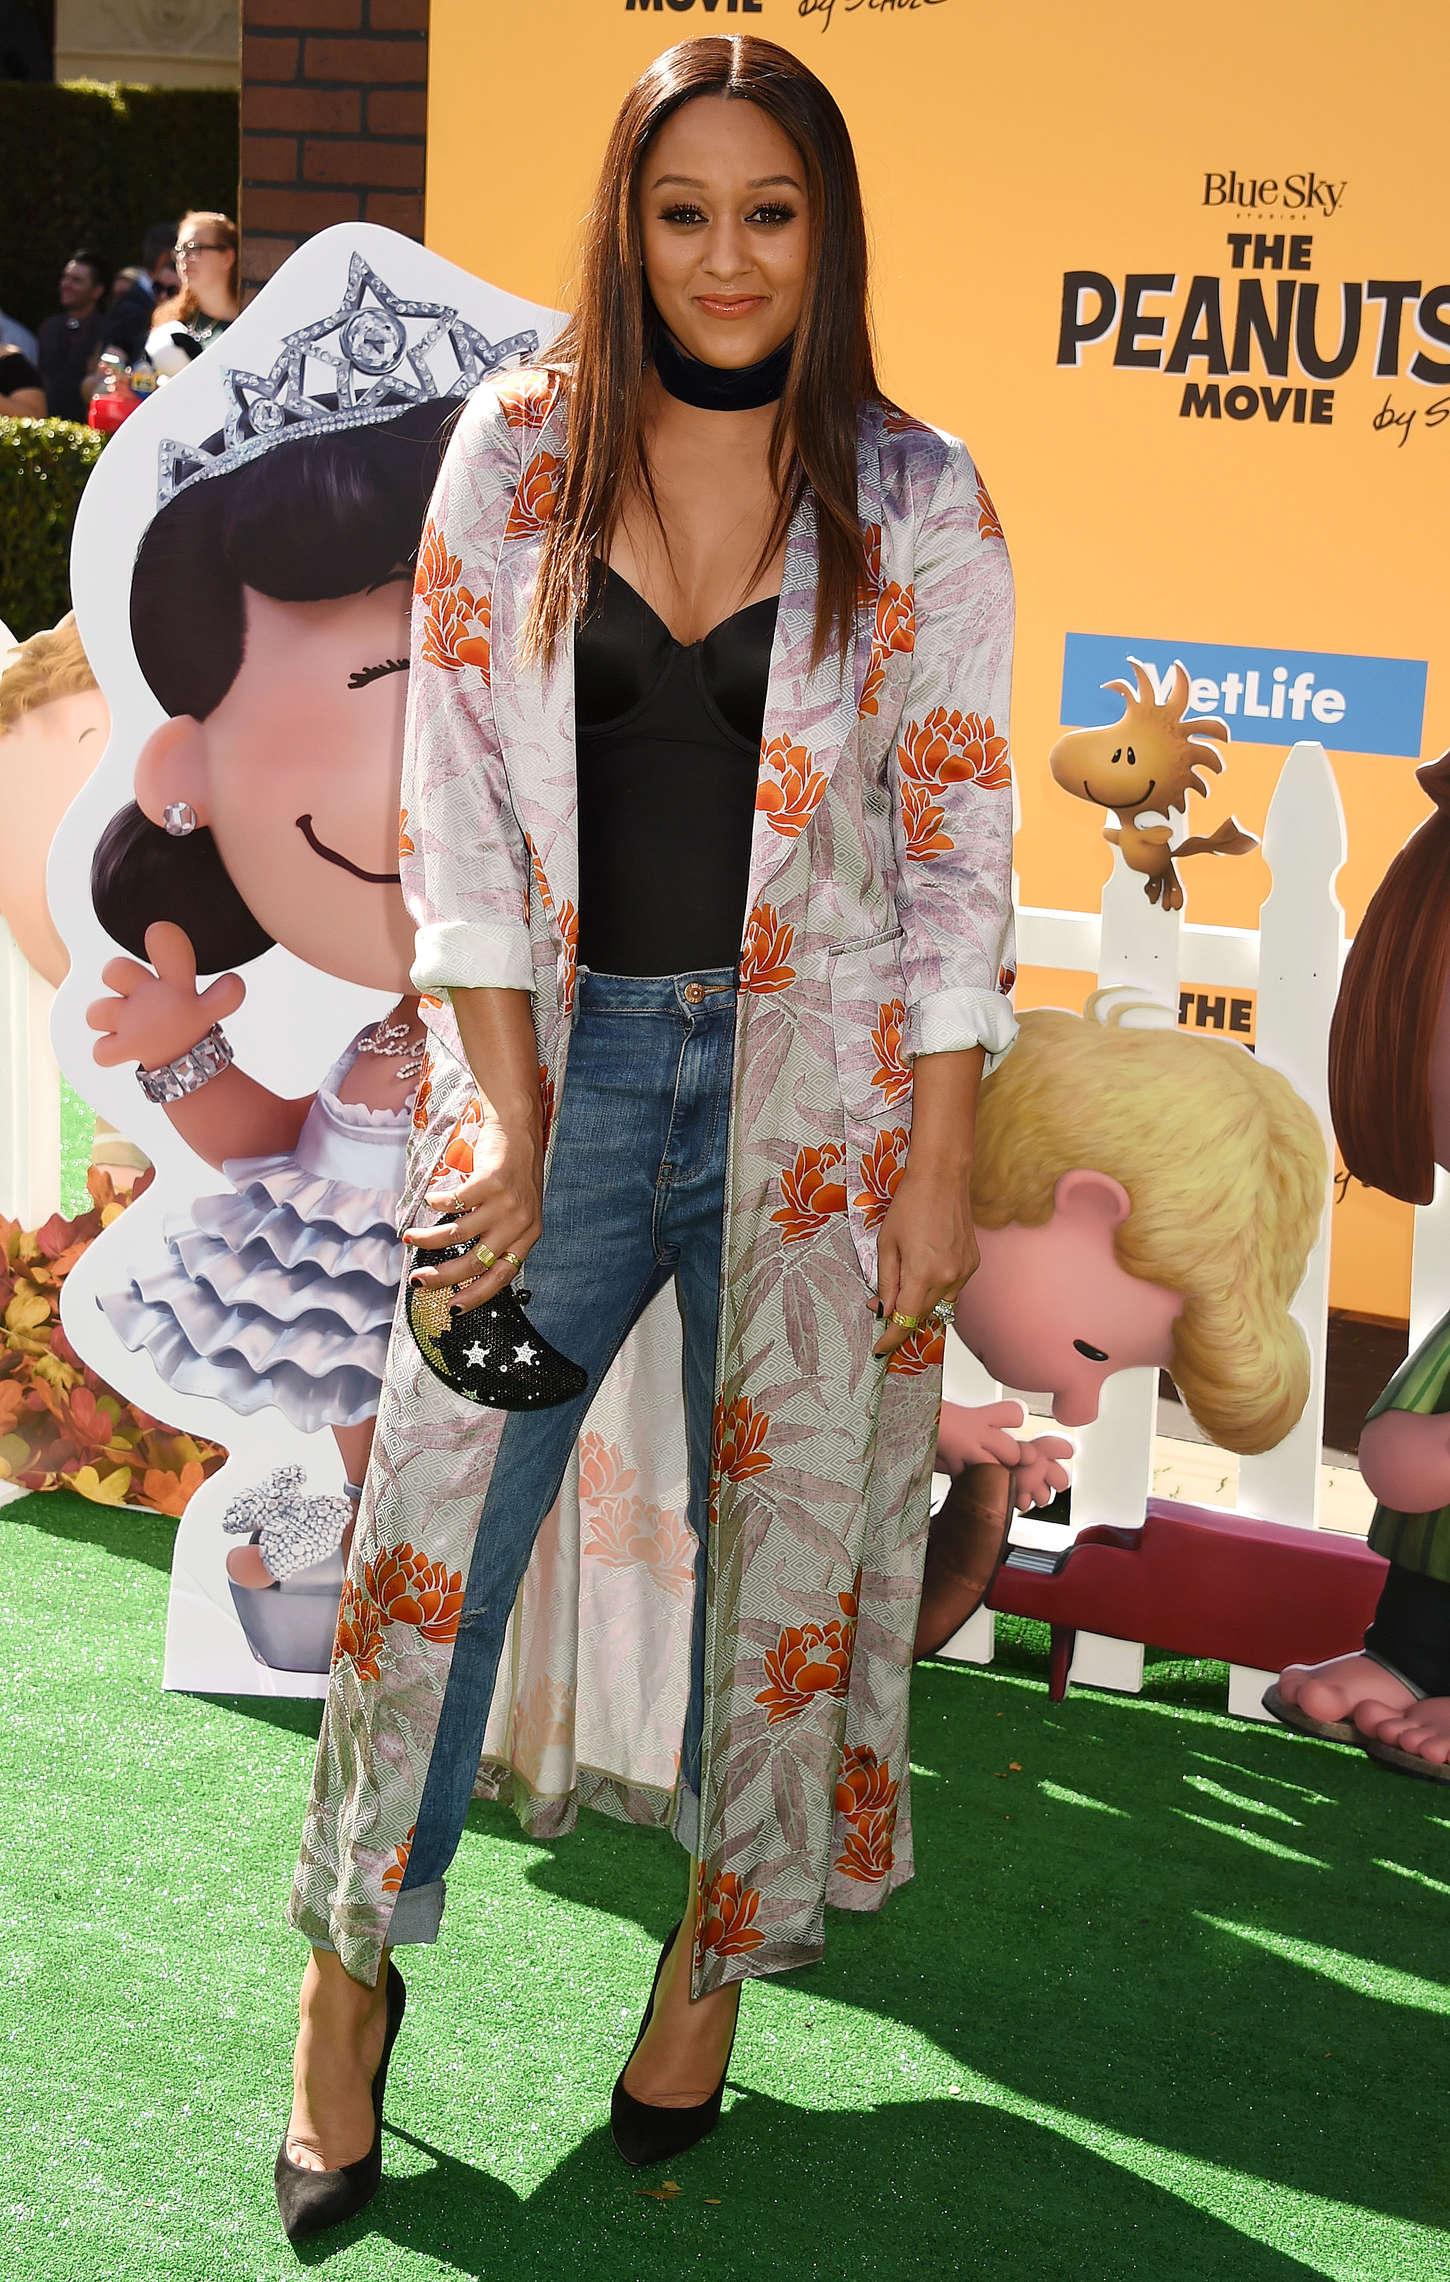 Tia Mowry The Peanuts Movie Premiere in Los Angeles